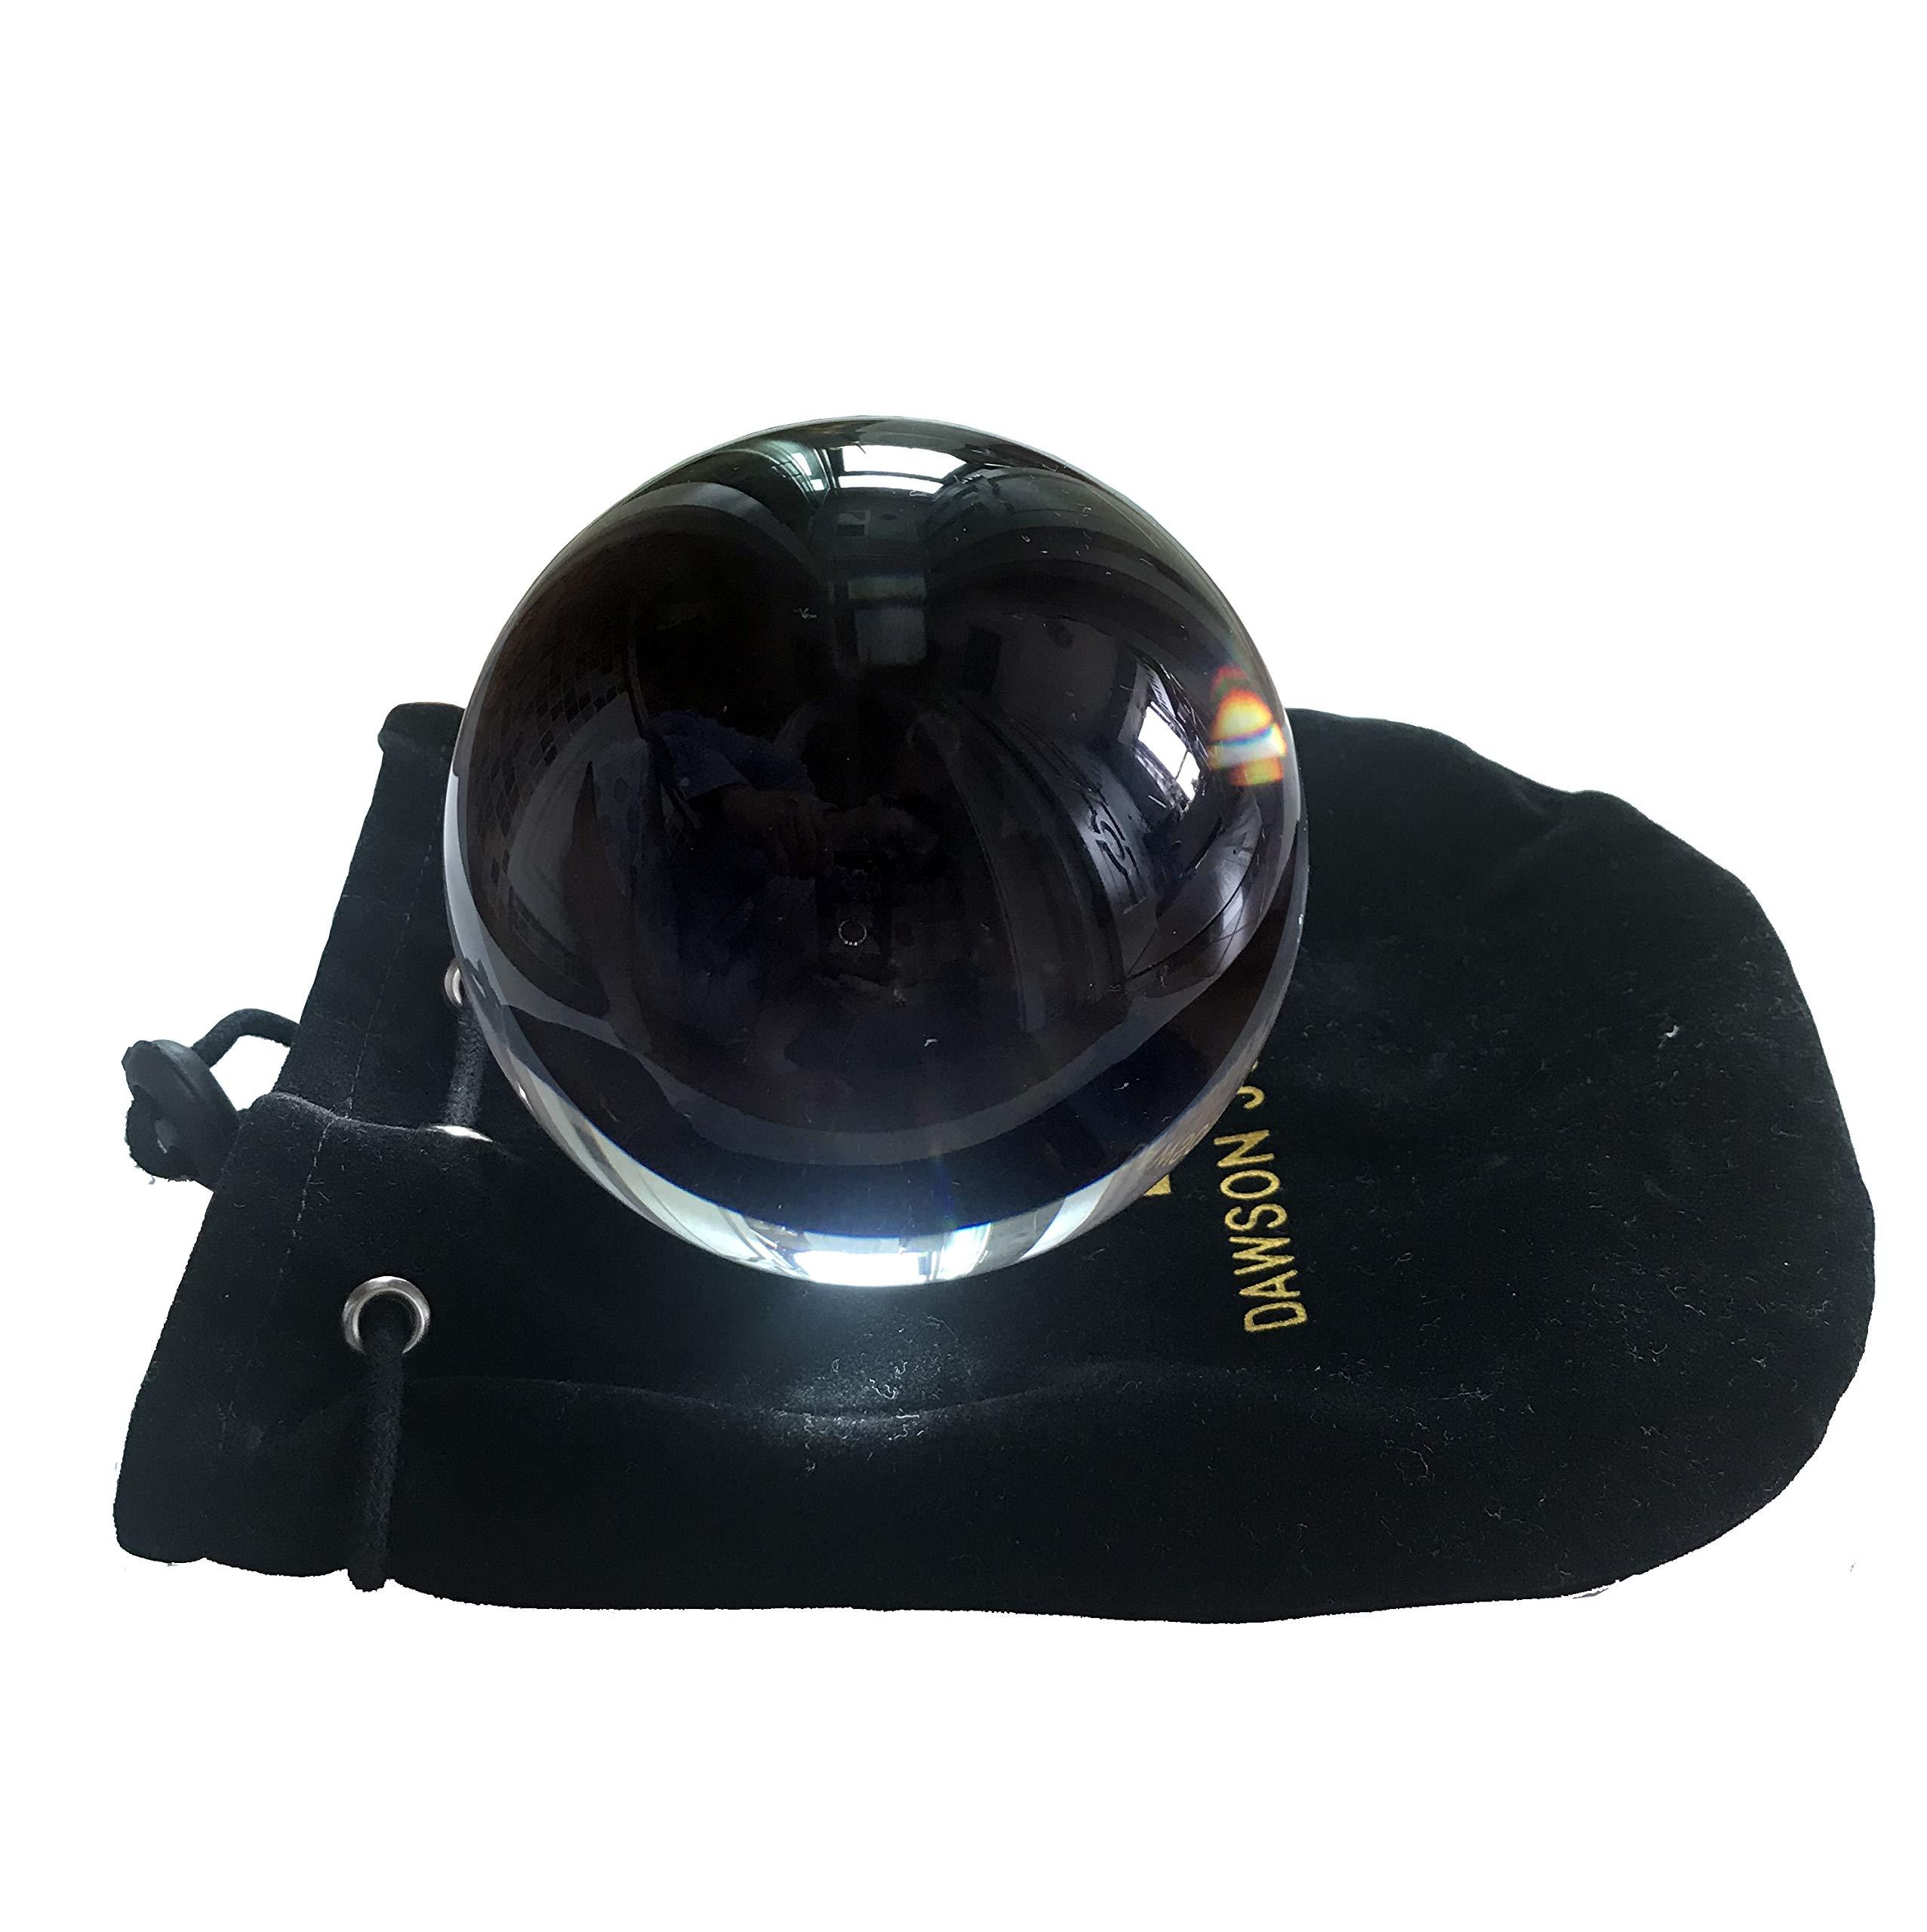 DSJUGGLING Clear UV Acrylic Contact Juggling Ball - 4'' - 100mm by DSJUGGLING (Image #2)